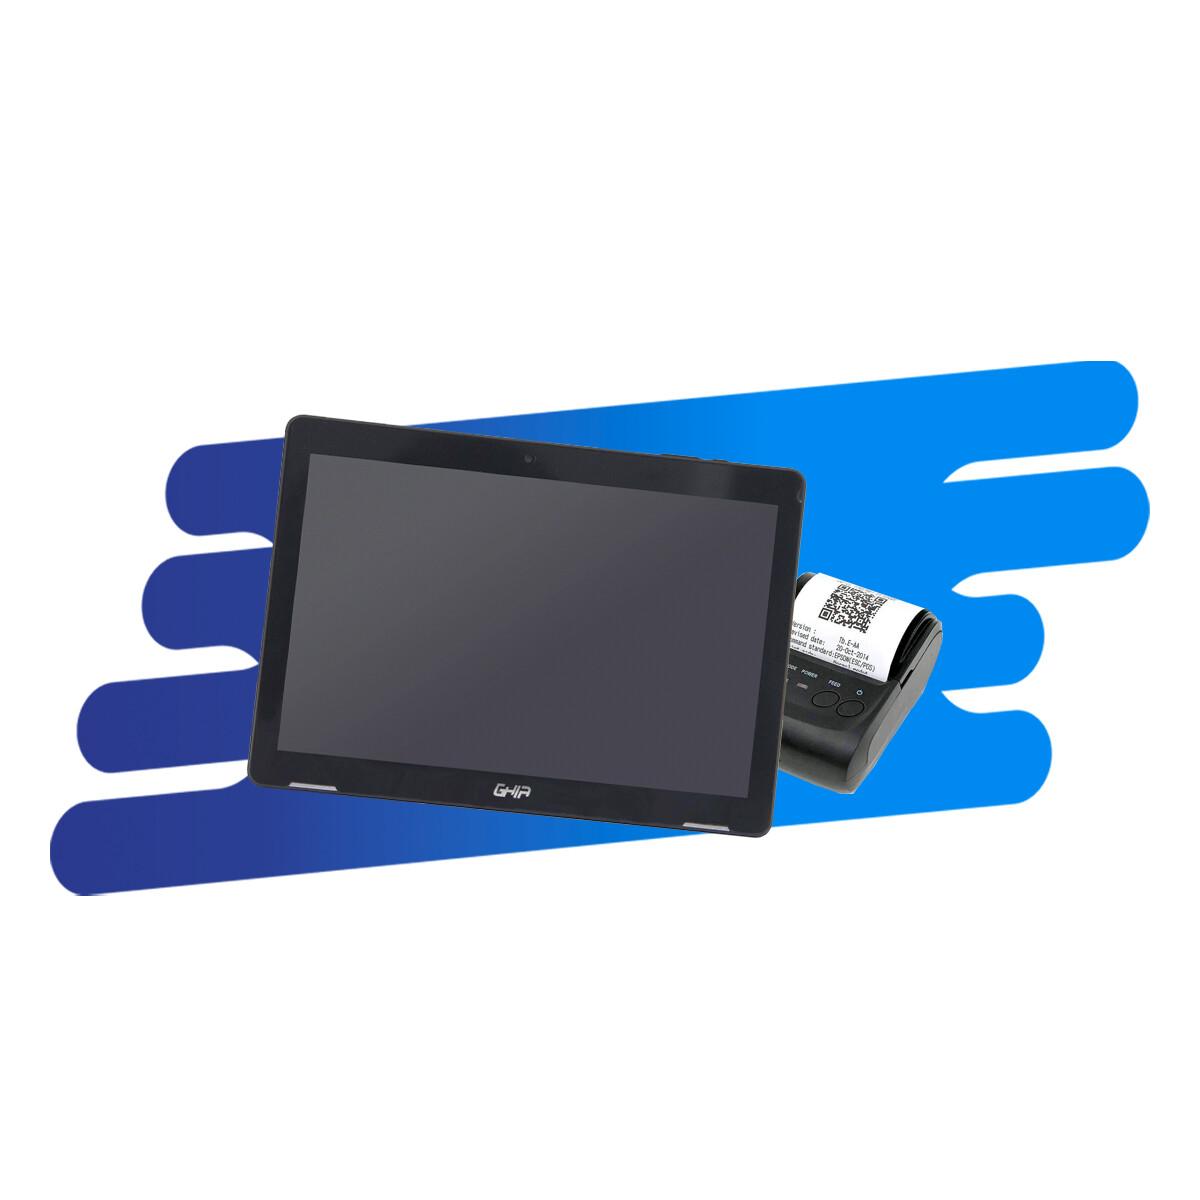 Kit Cloud (Tablet, Impresora de Tickets Bluetooth)